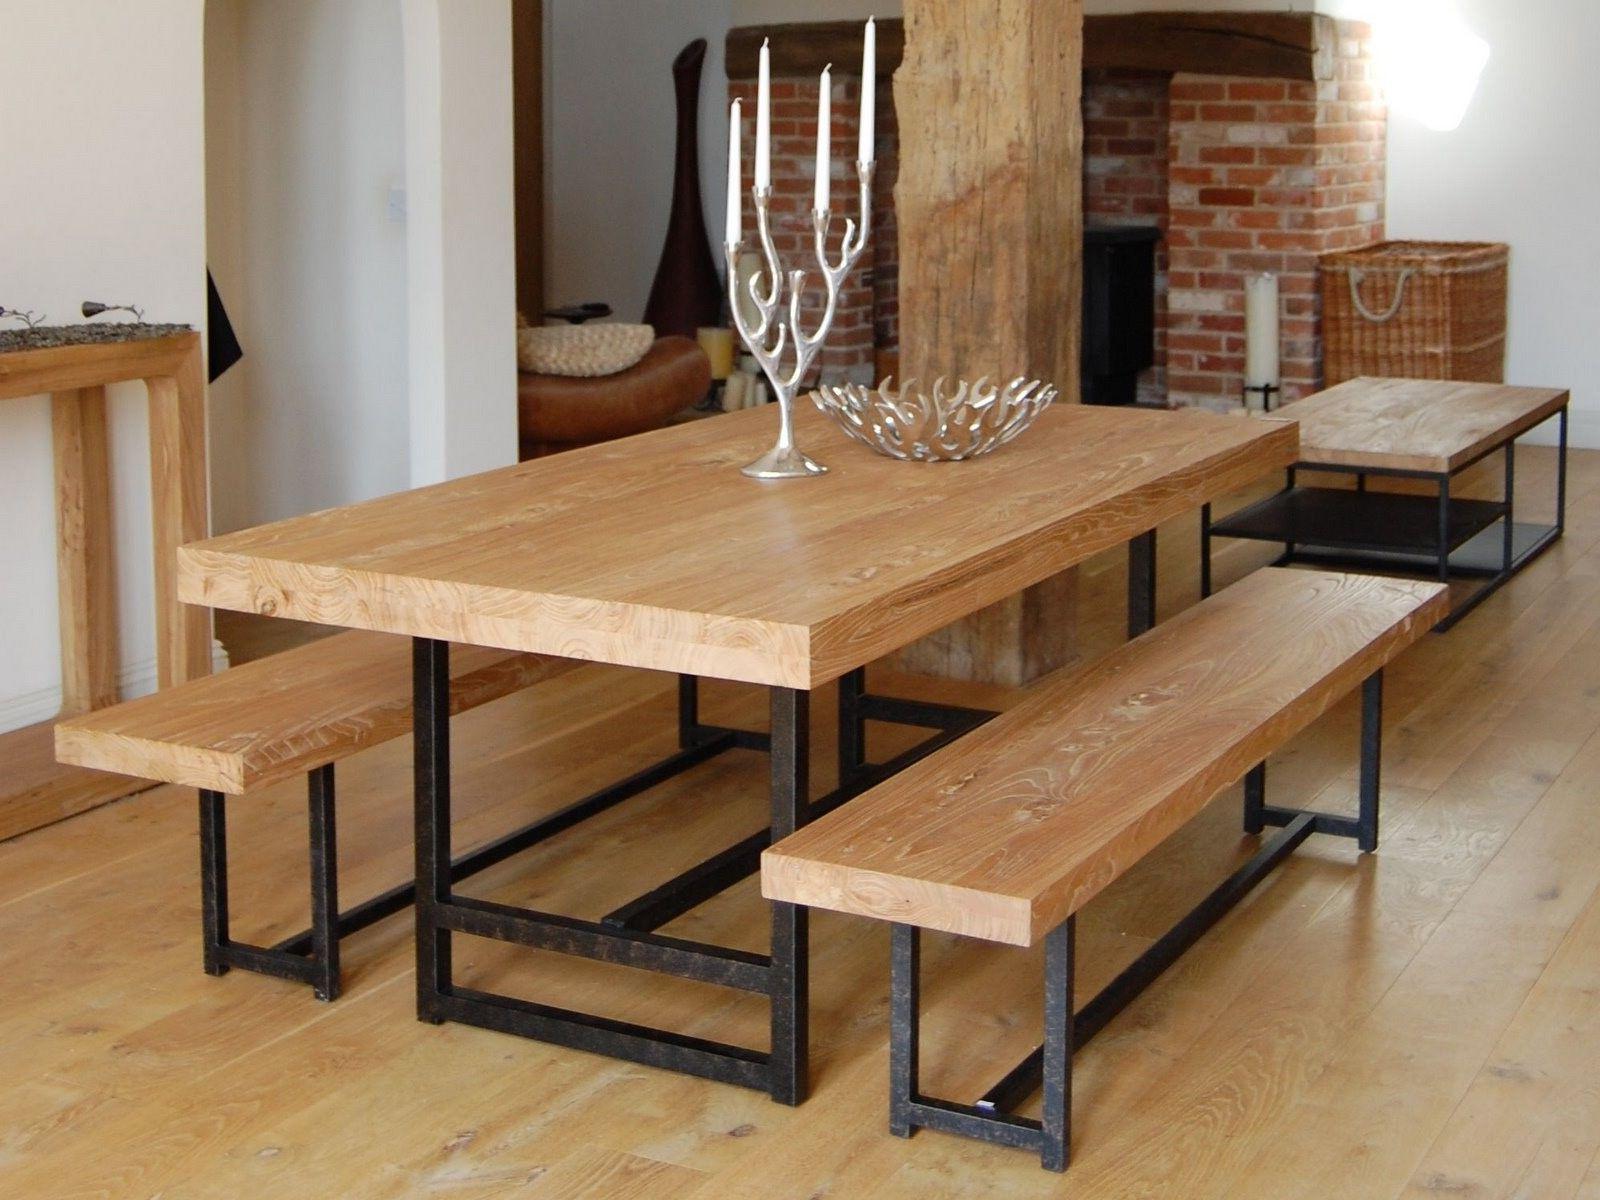 Acacia Dining Tables With Black Rocket Legs With Trendy Wonderful Dark Brown Black Wood Modern Design Wood Furniture (View 9 of 25)